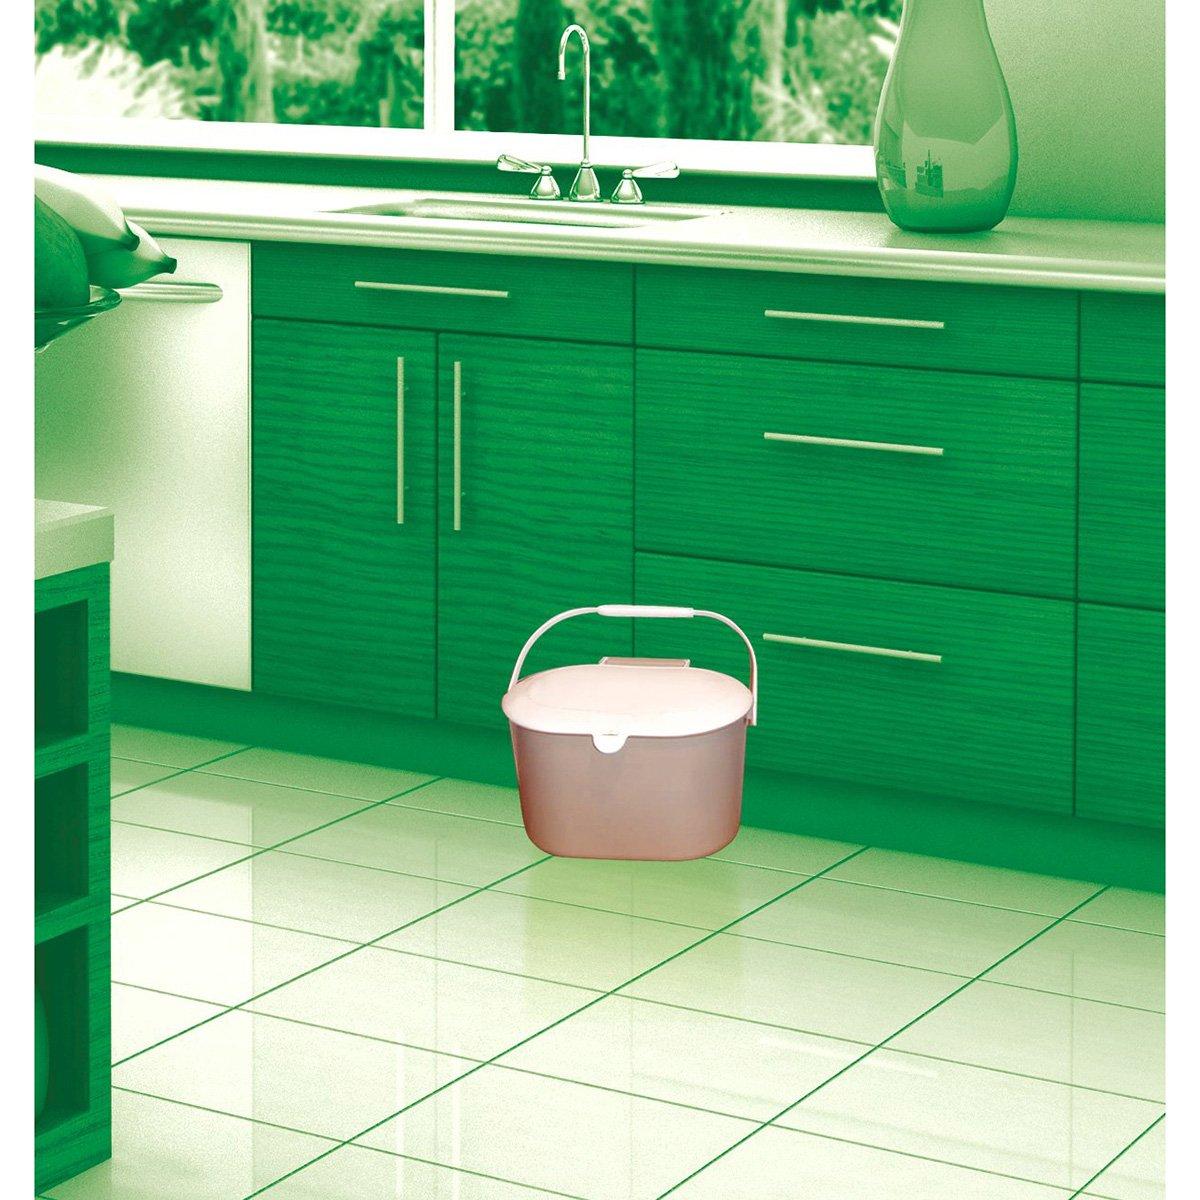 Glad OdorShield Small Kitchen Compostable Trash Bags, 2.6